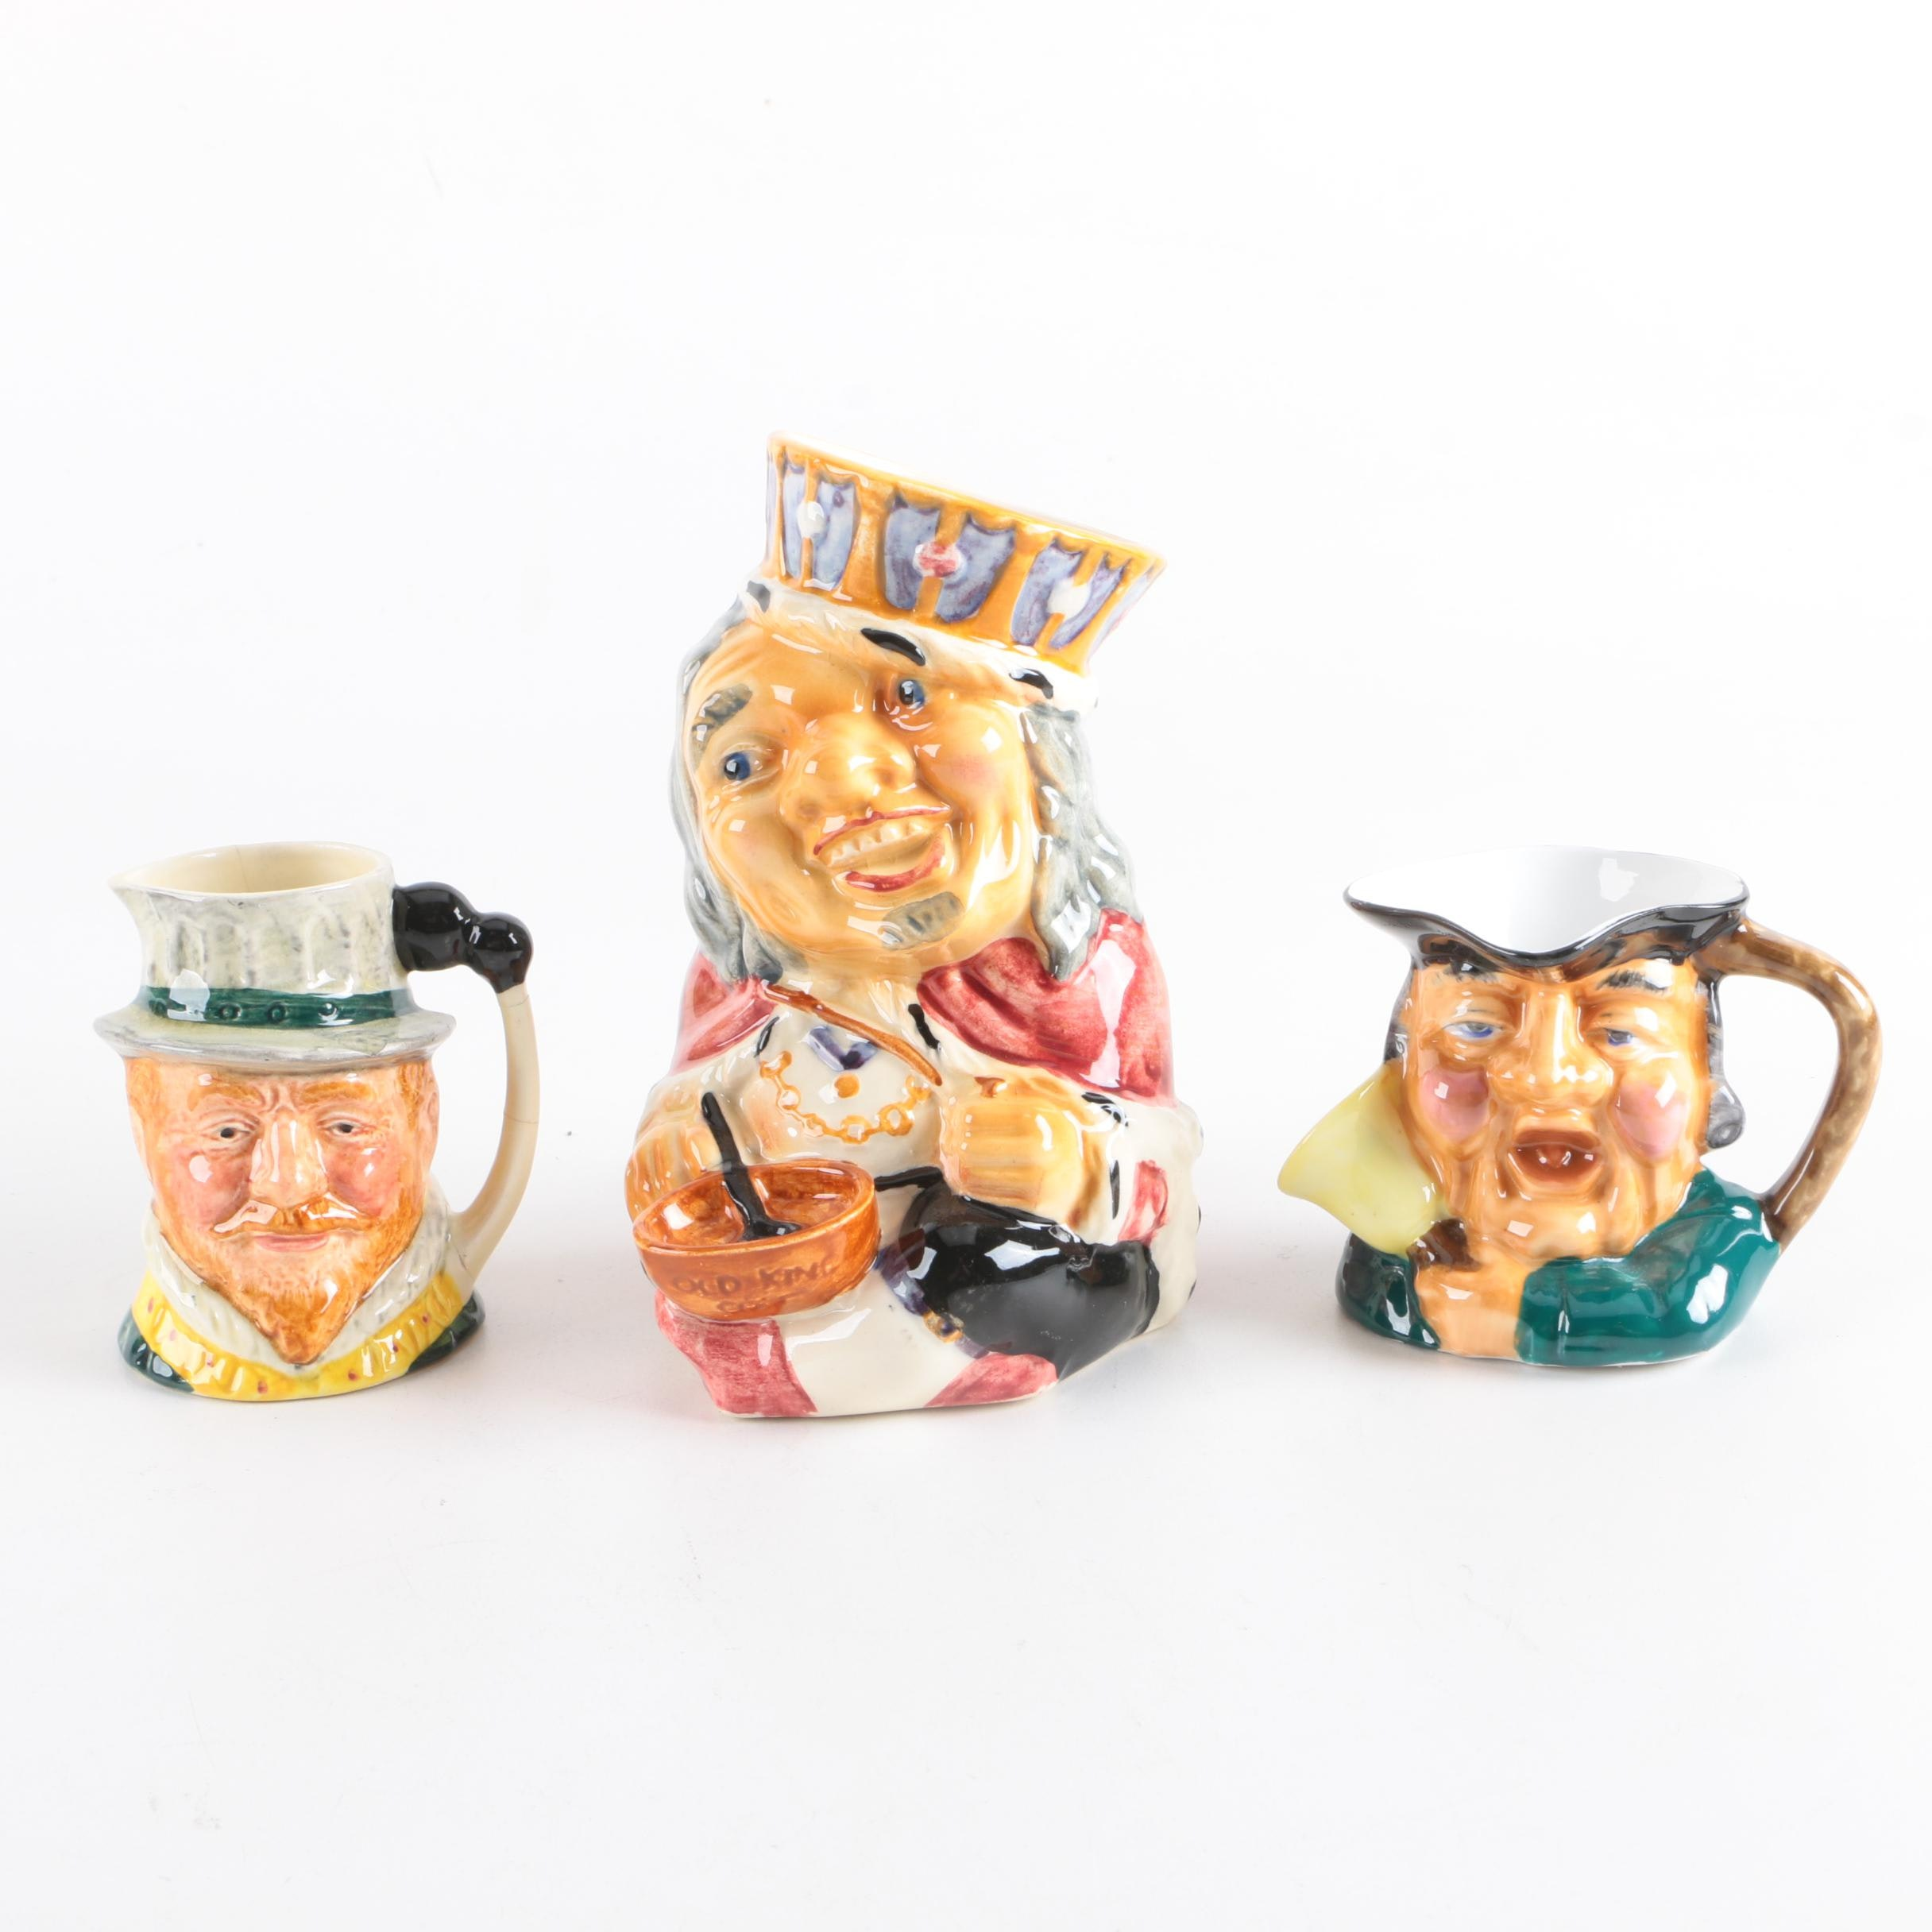 Ceramic Character Jugs and Mug